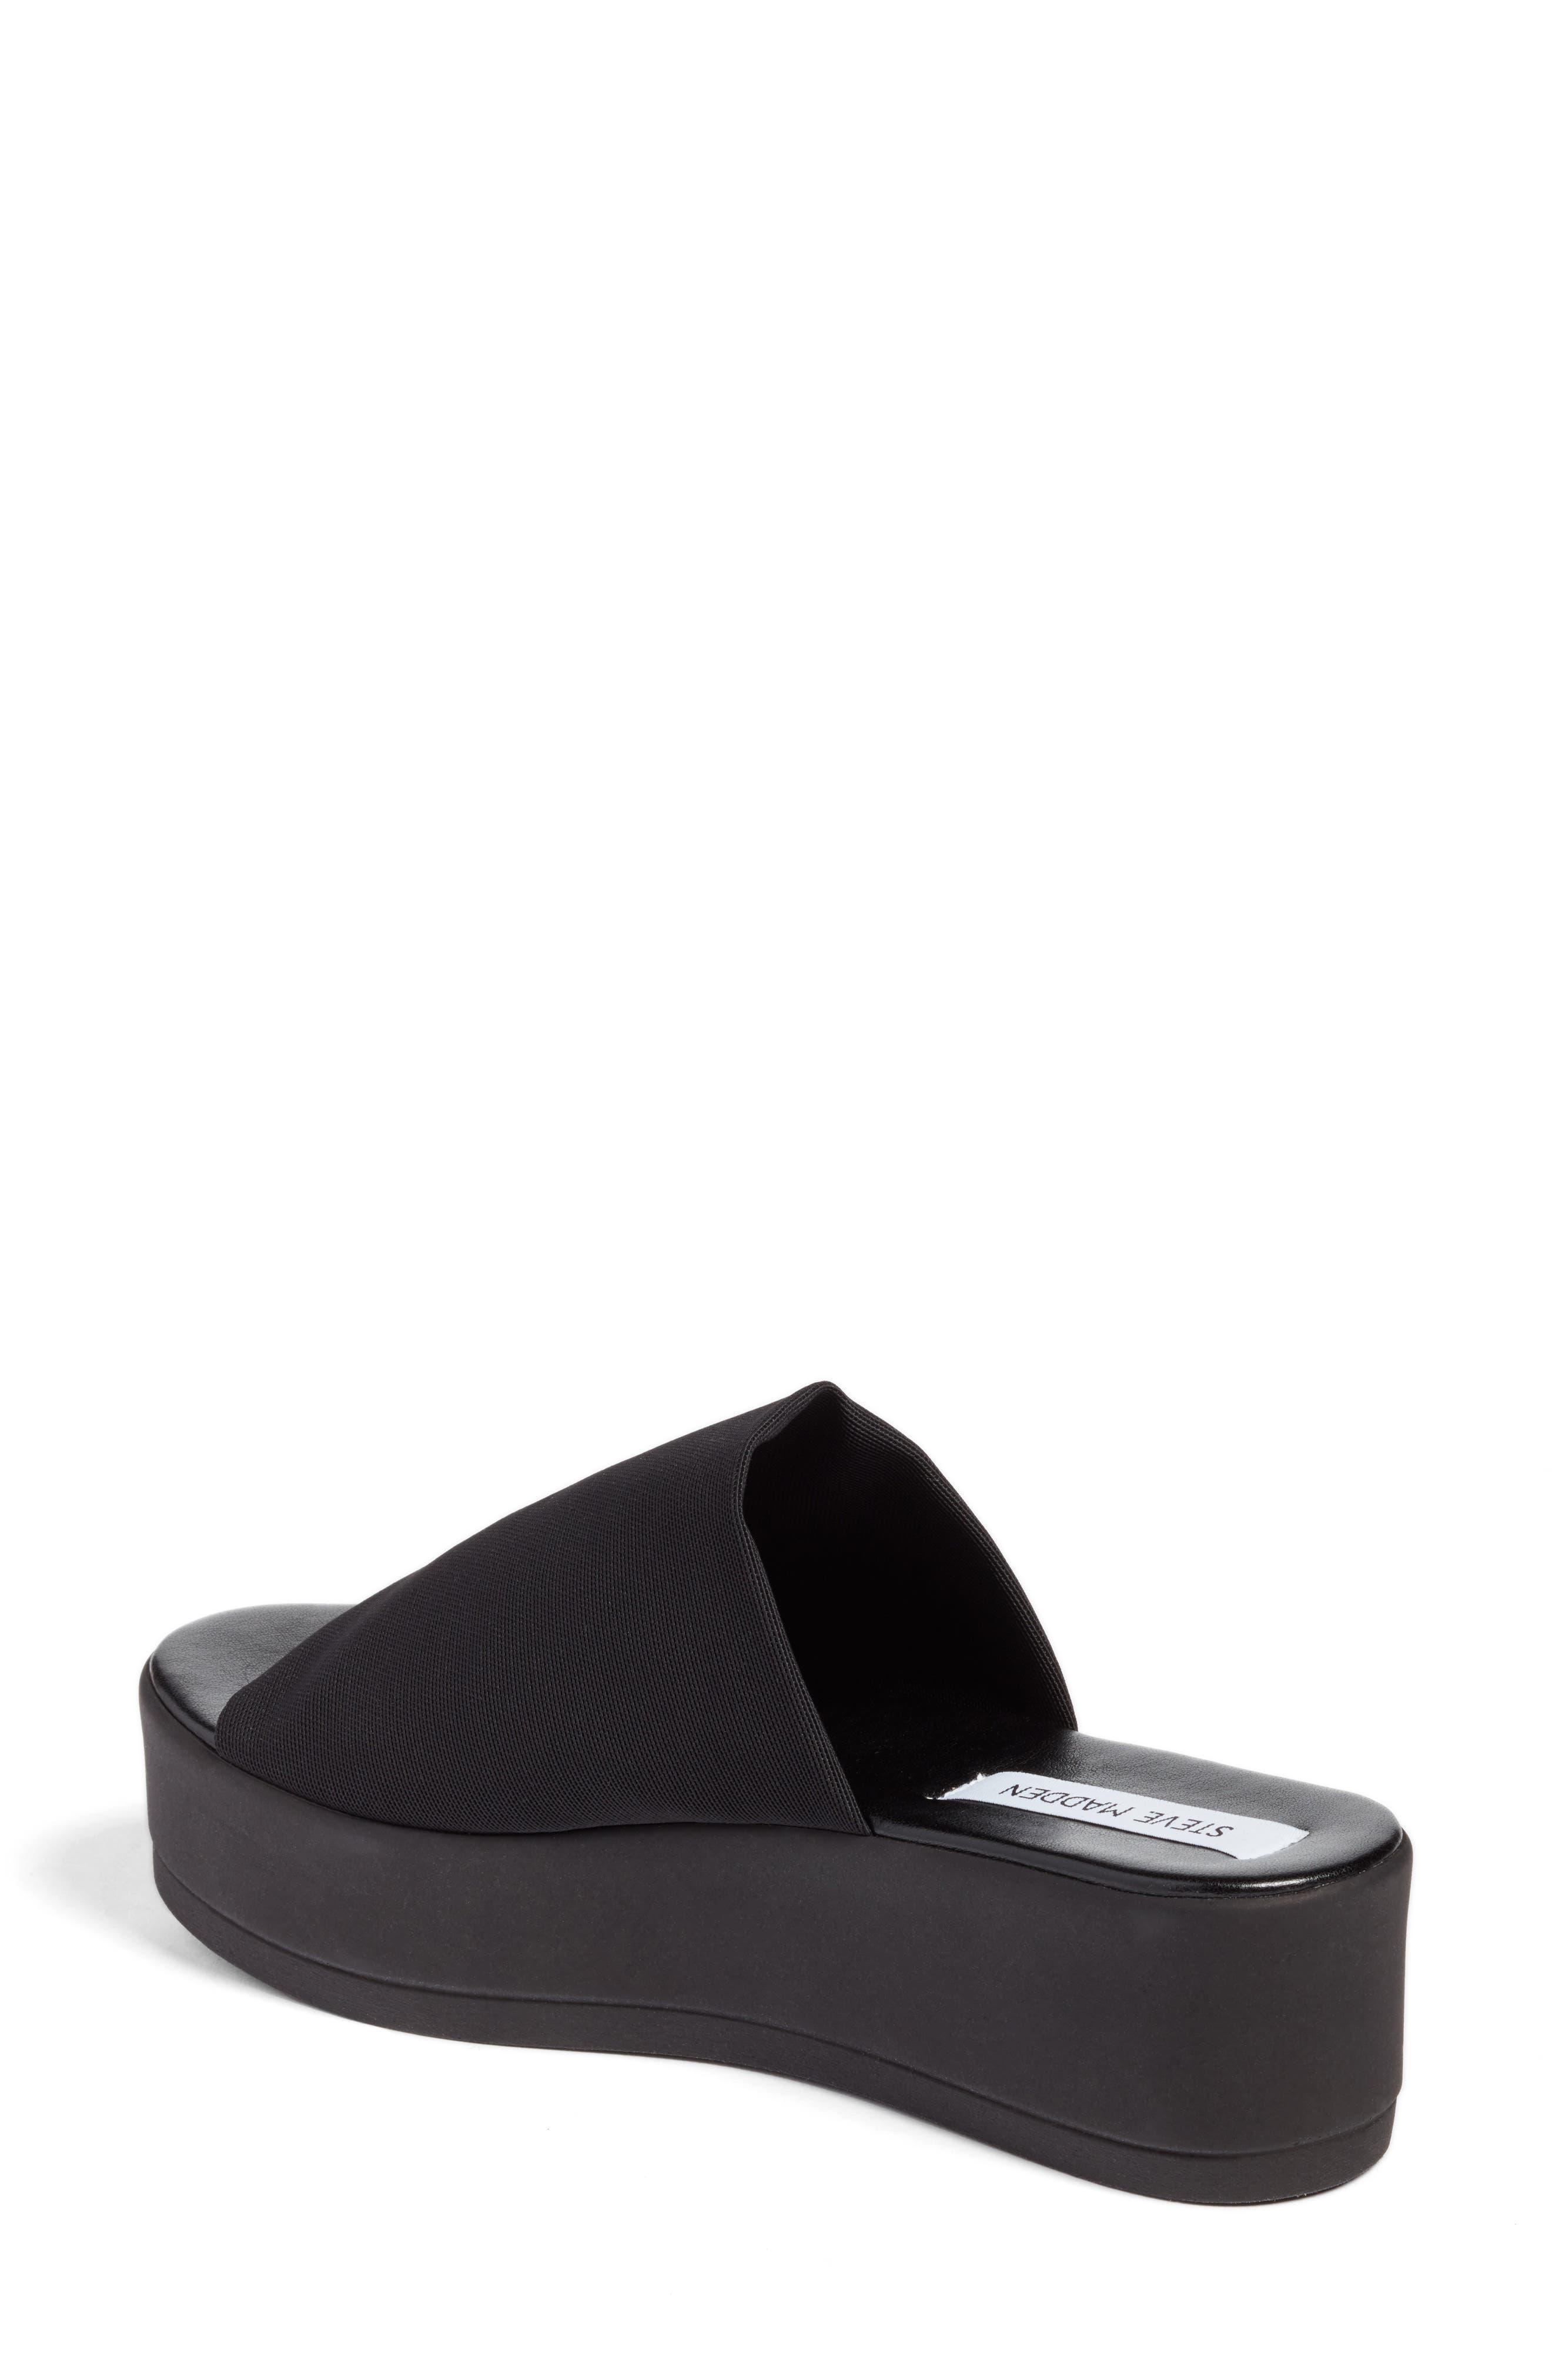 Slinky Platform Sandal,                             Alternate thumbnail 2, color,                             Black